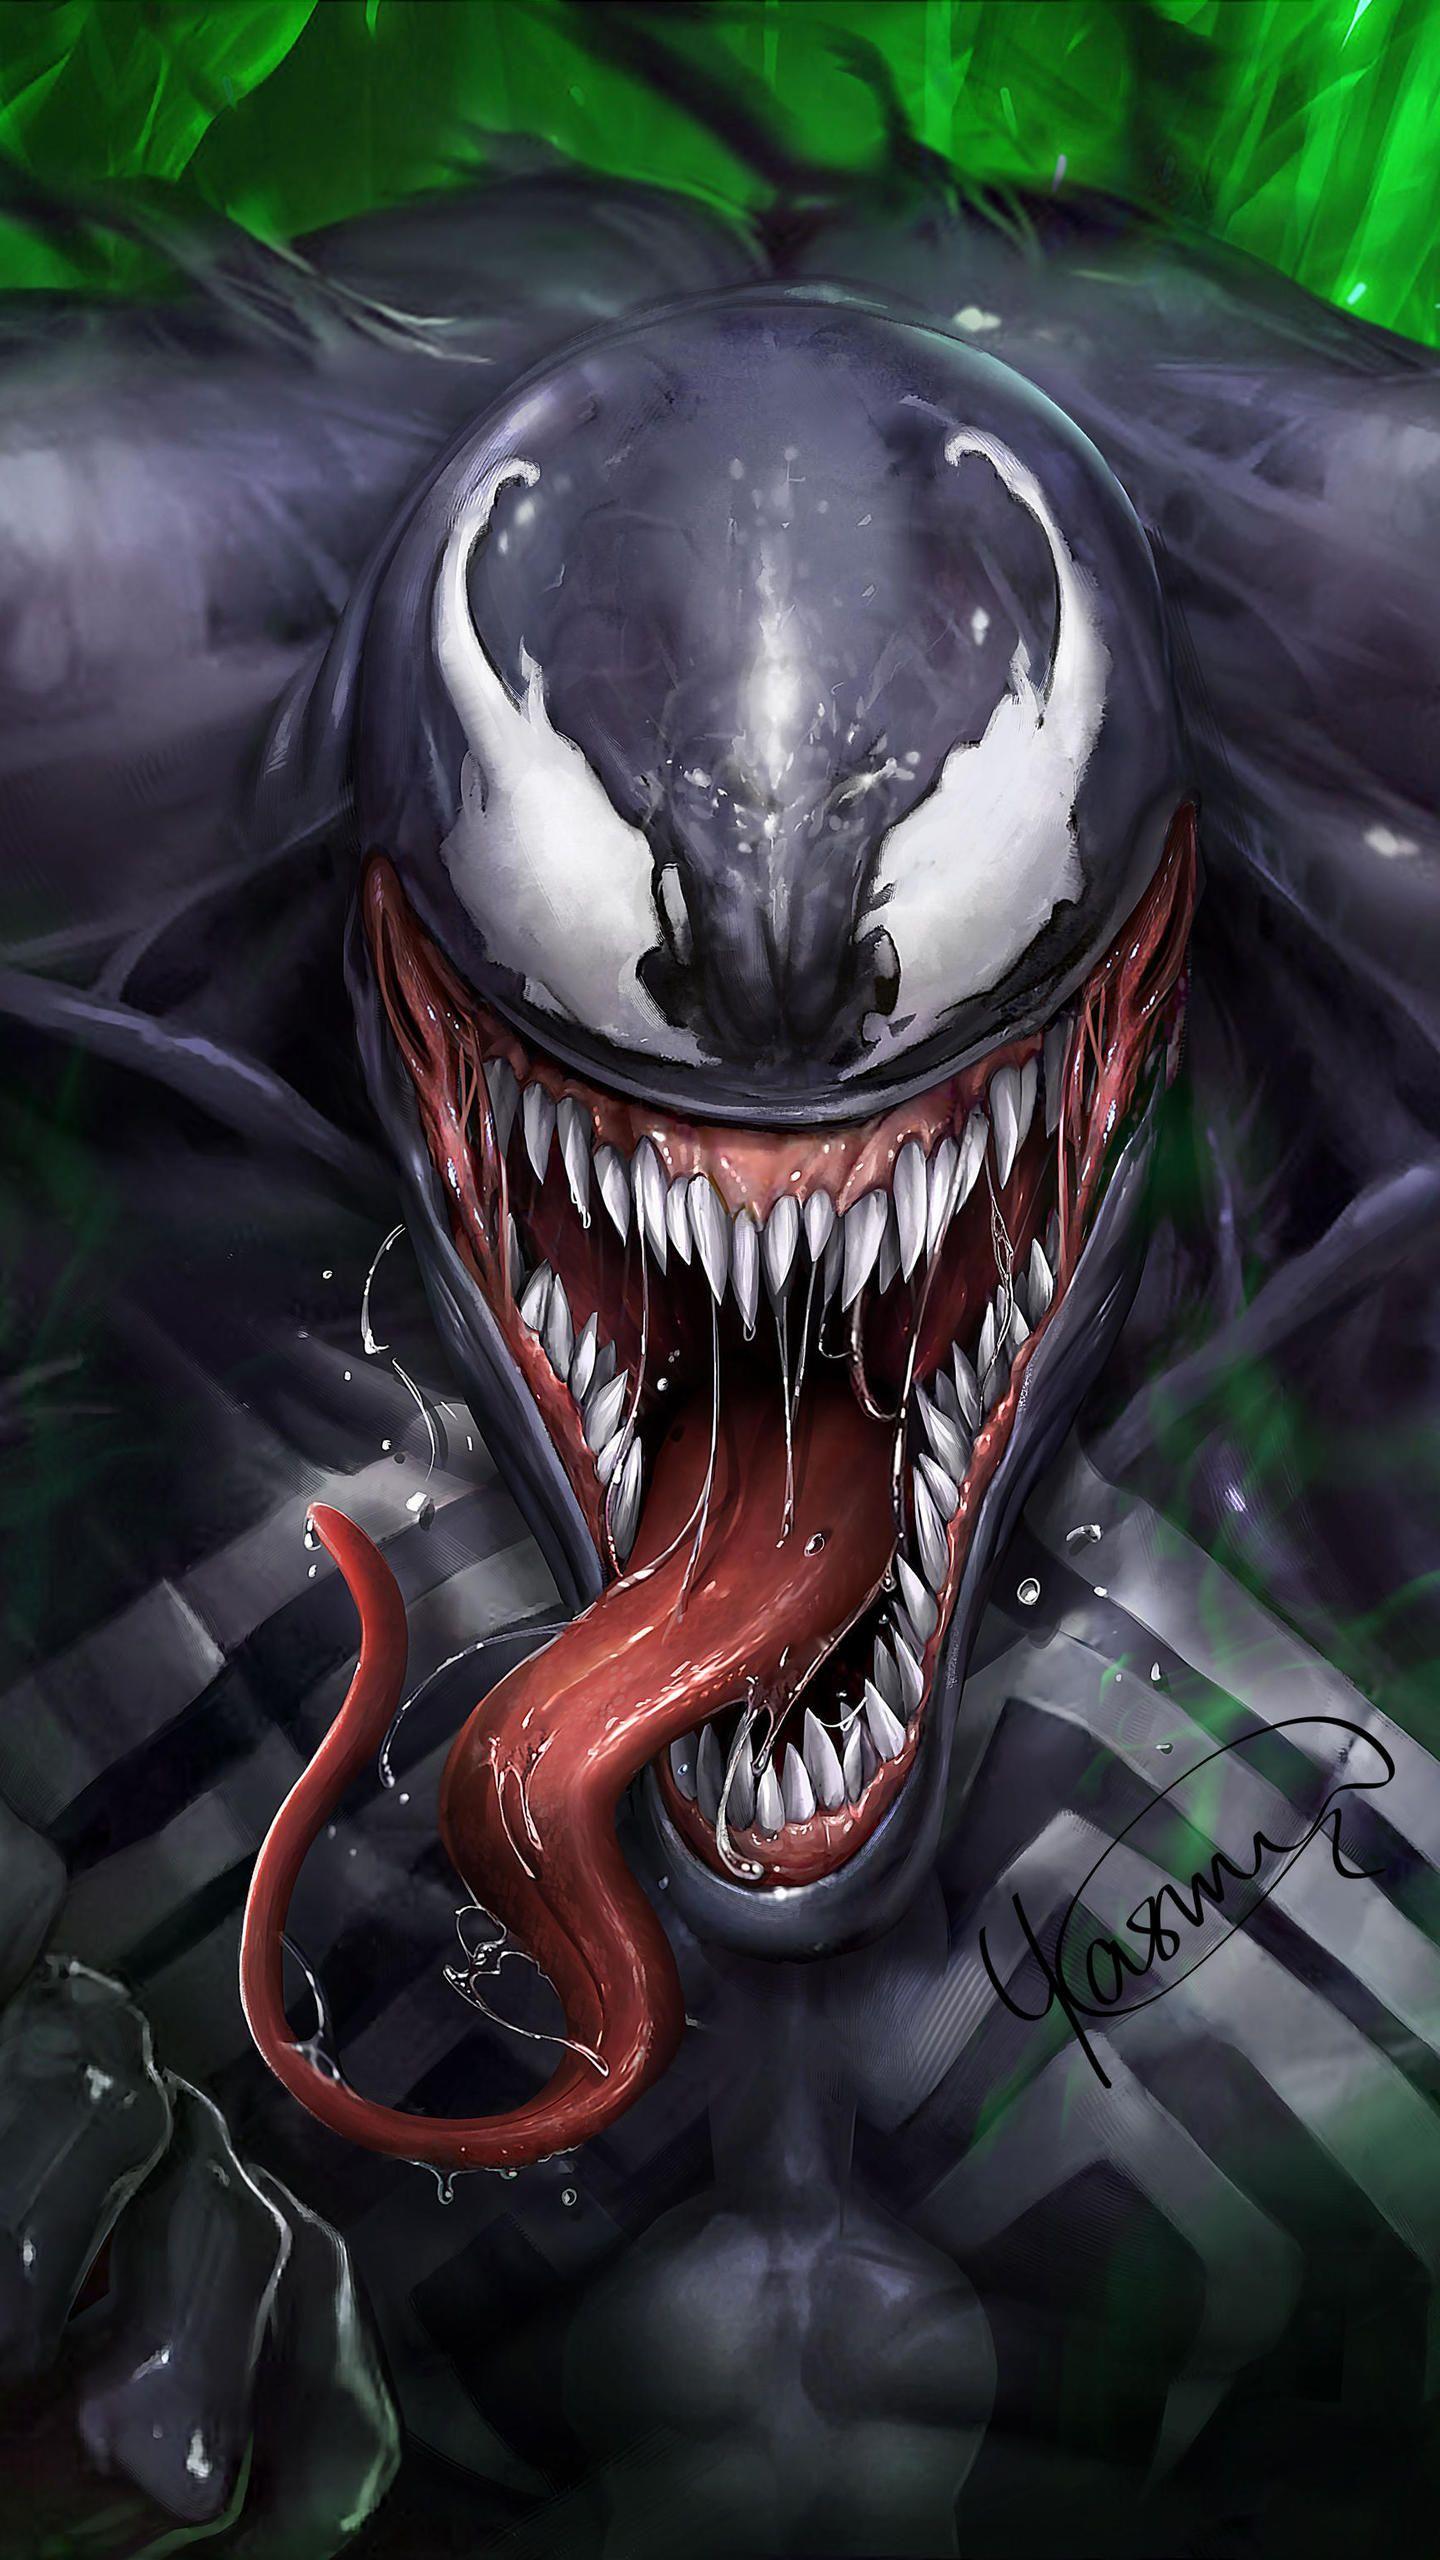 Top Venom Wallpapers For Your Iphone Wallpaper Venom Comics Venom Pictures Spiderman Art